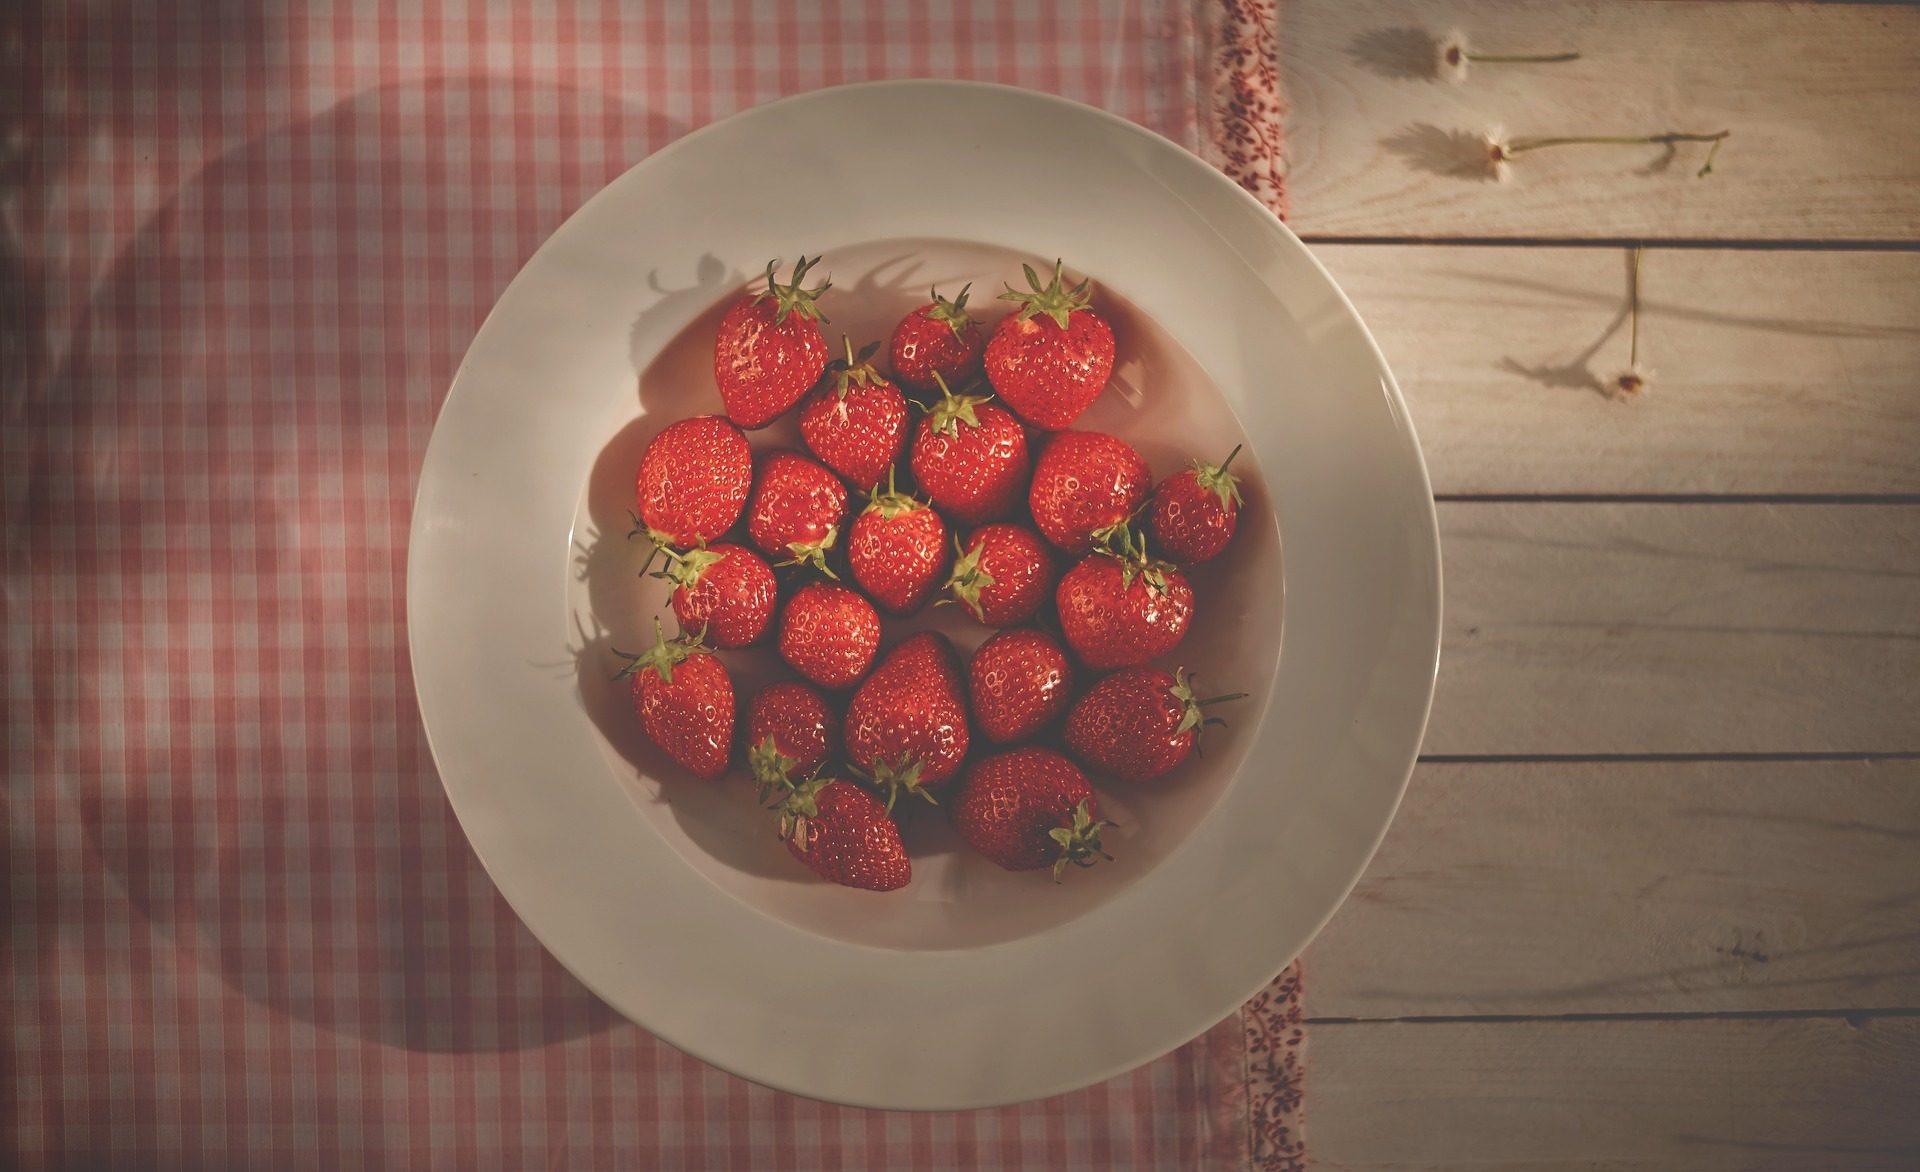 fresas, plato, fruta, mesa, mantel, flores - Fondos de Pantalla HD - professor-falken.com